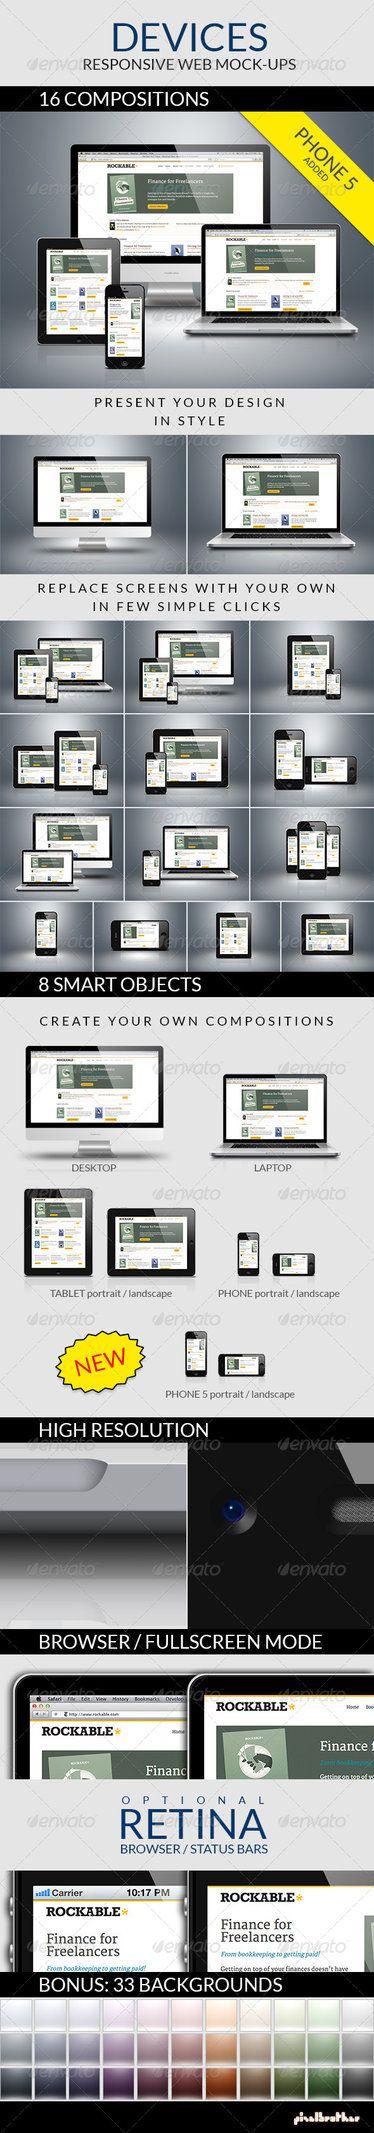 Devices - Responsive Web Mock-ups by GraphicAssets.deviantart.com on @DeviantArt